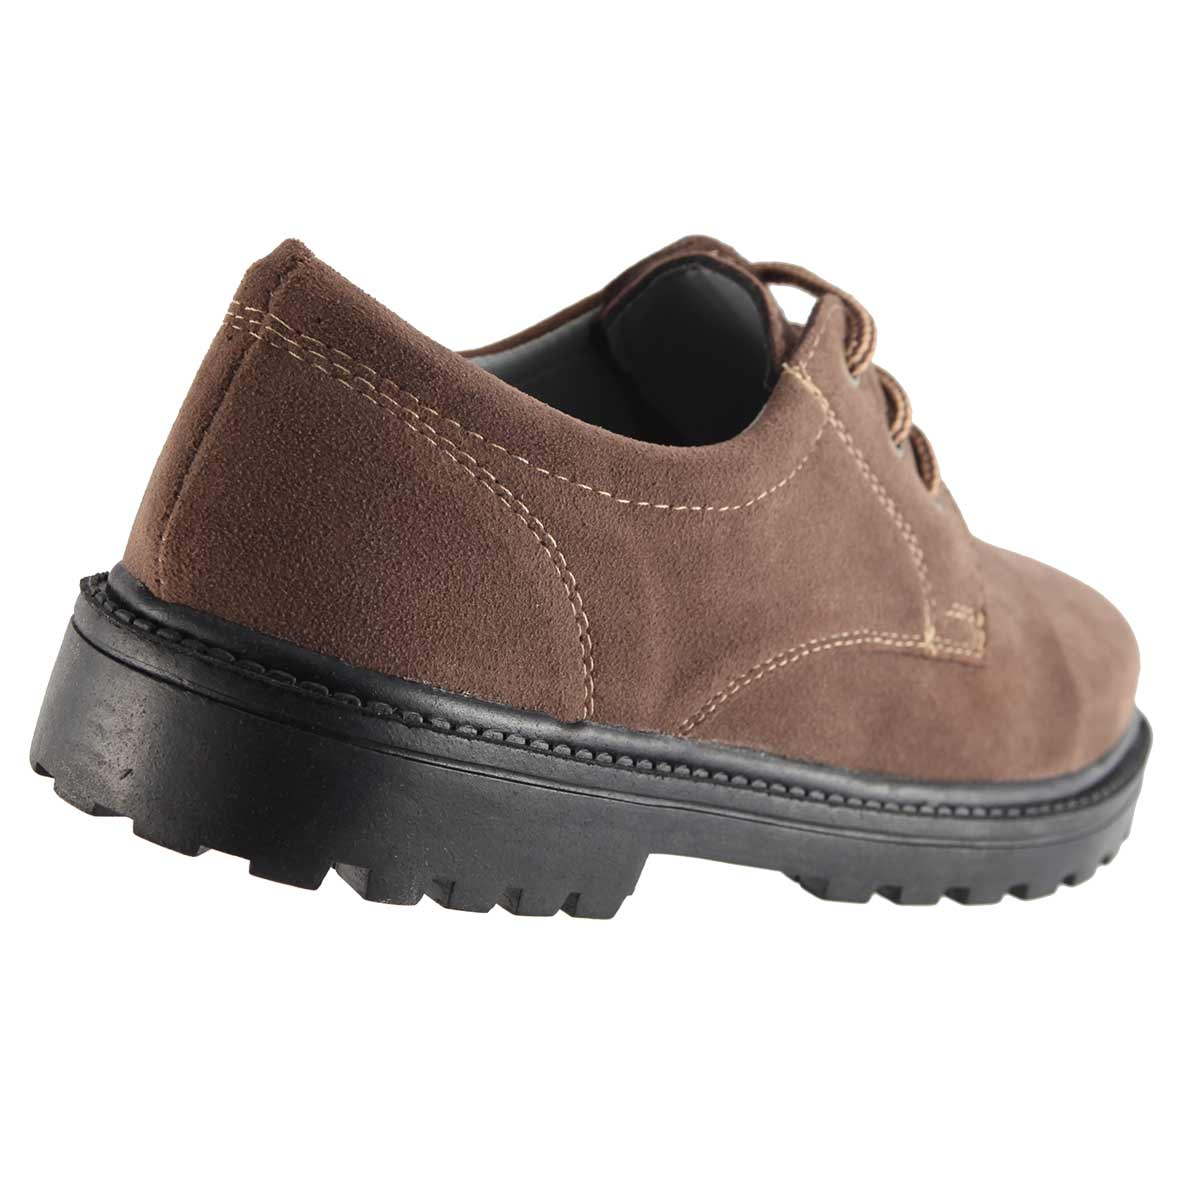 Sapato Masculino Sekall Camurça Cadarço 7005